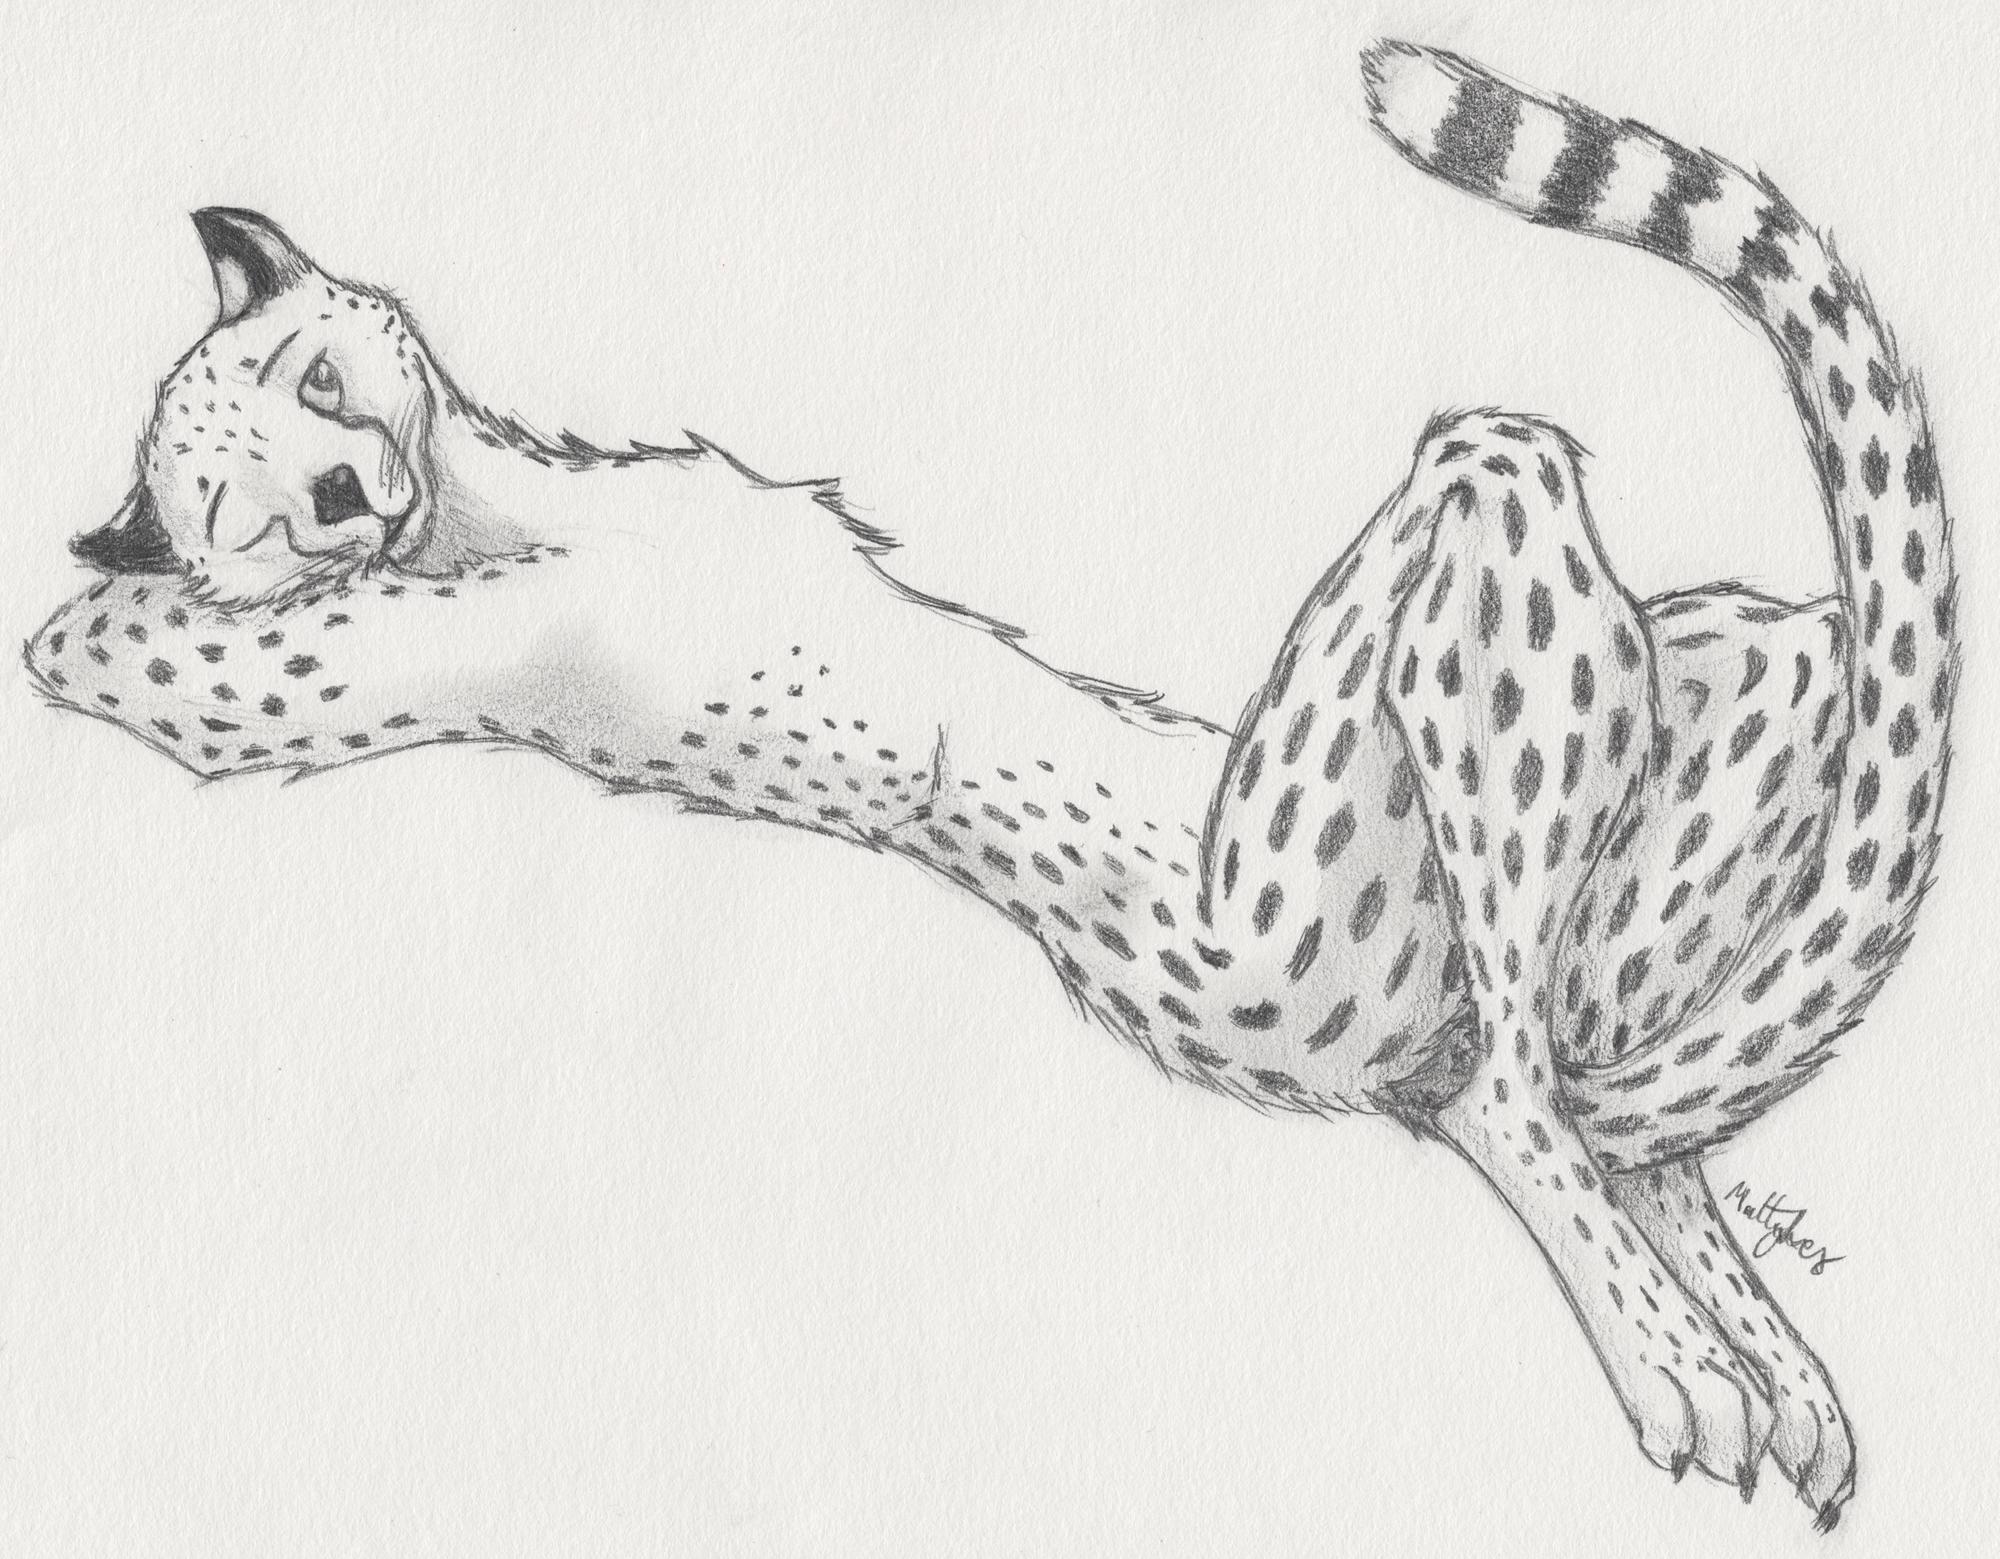 Cheetah Sketch by mattyhex